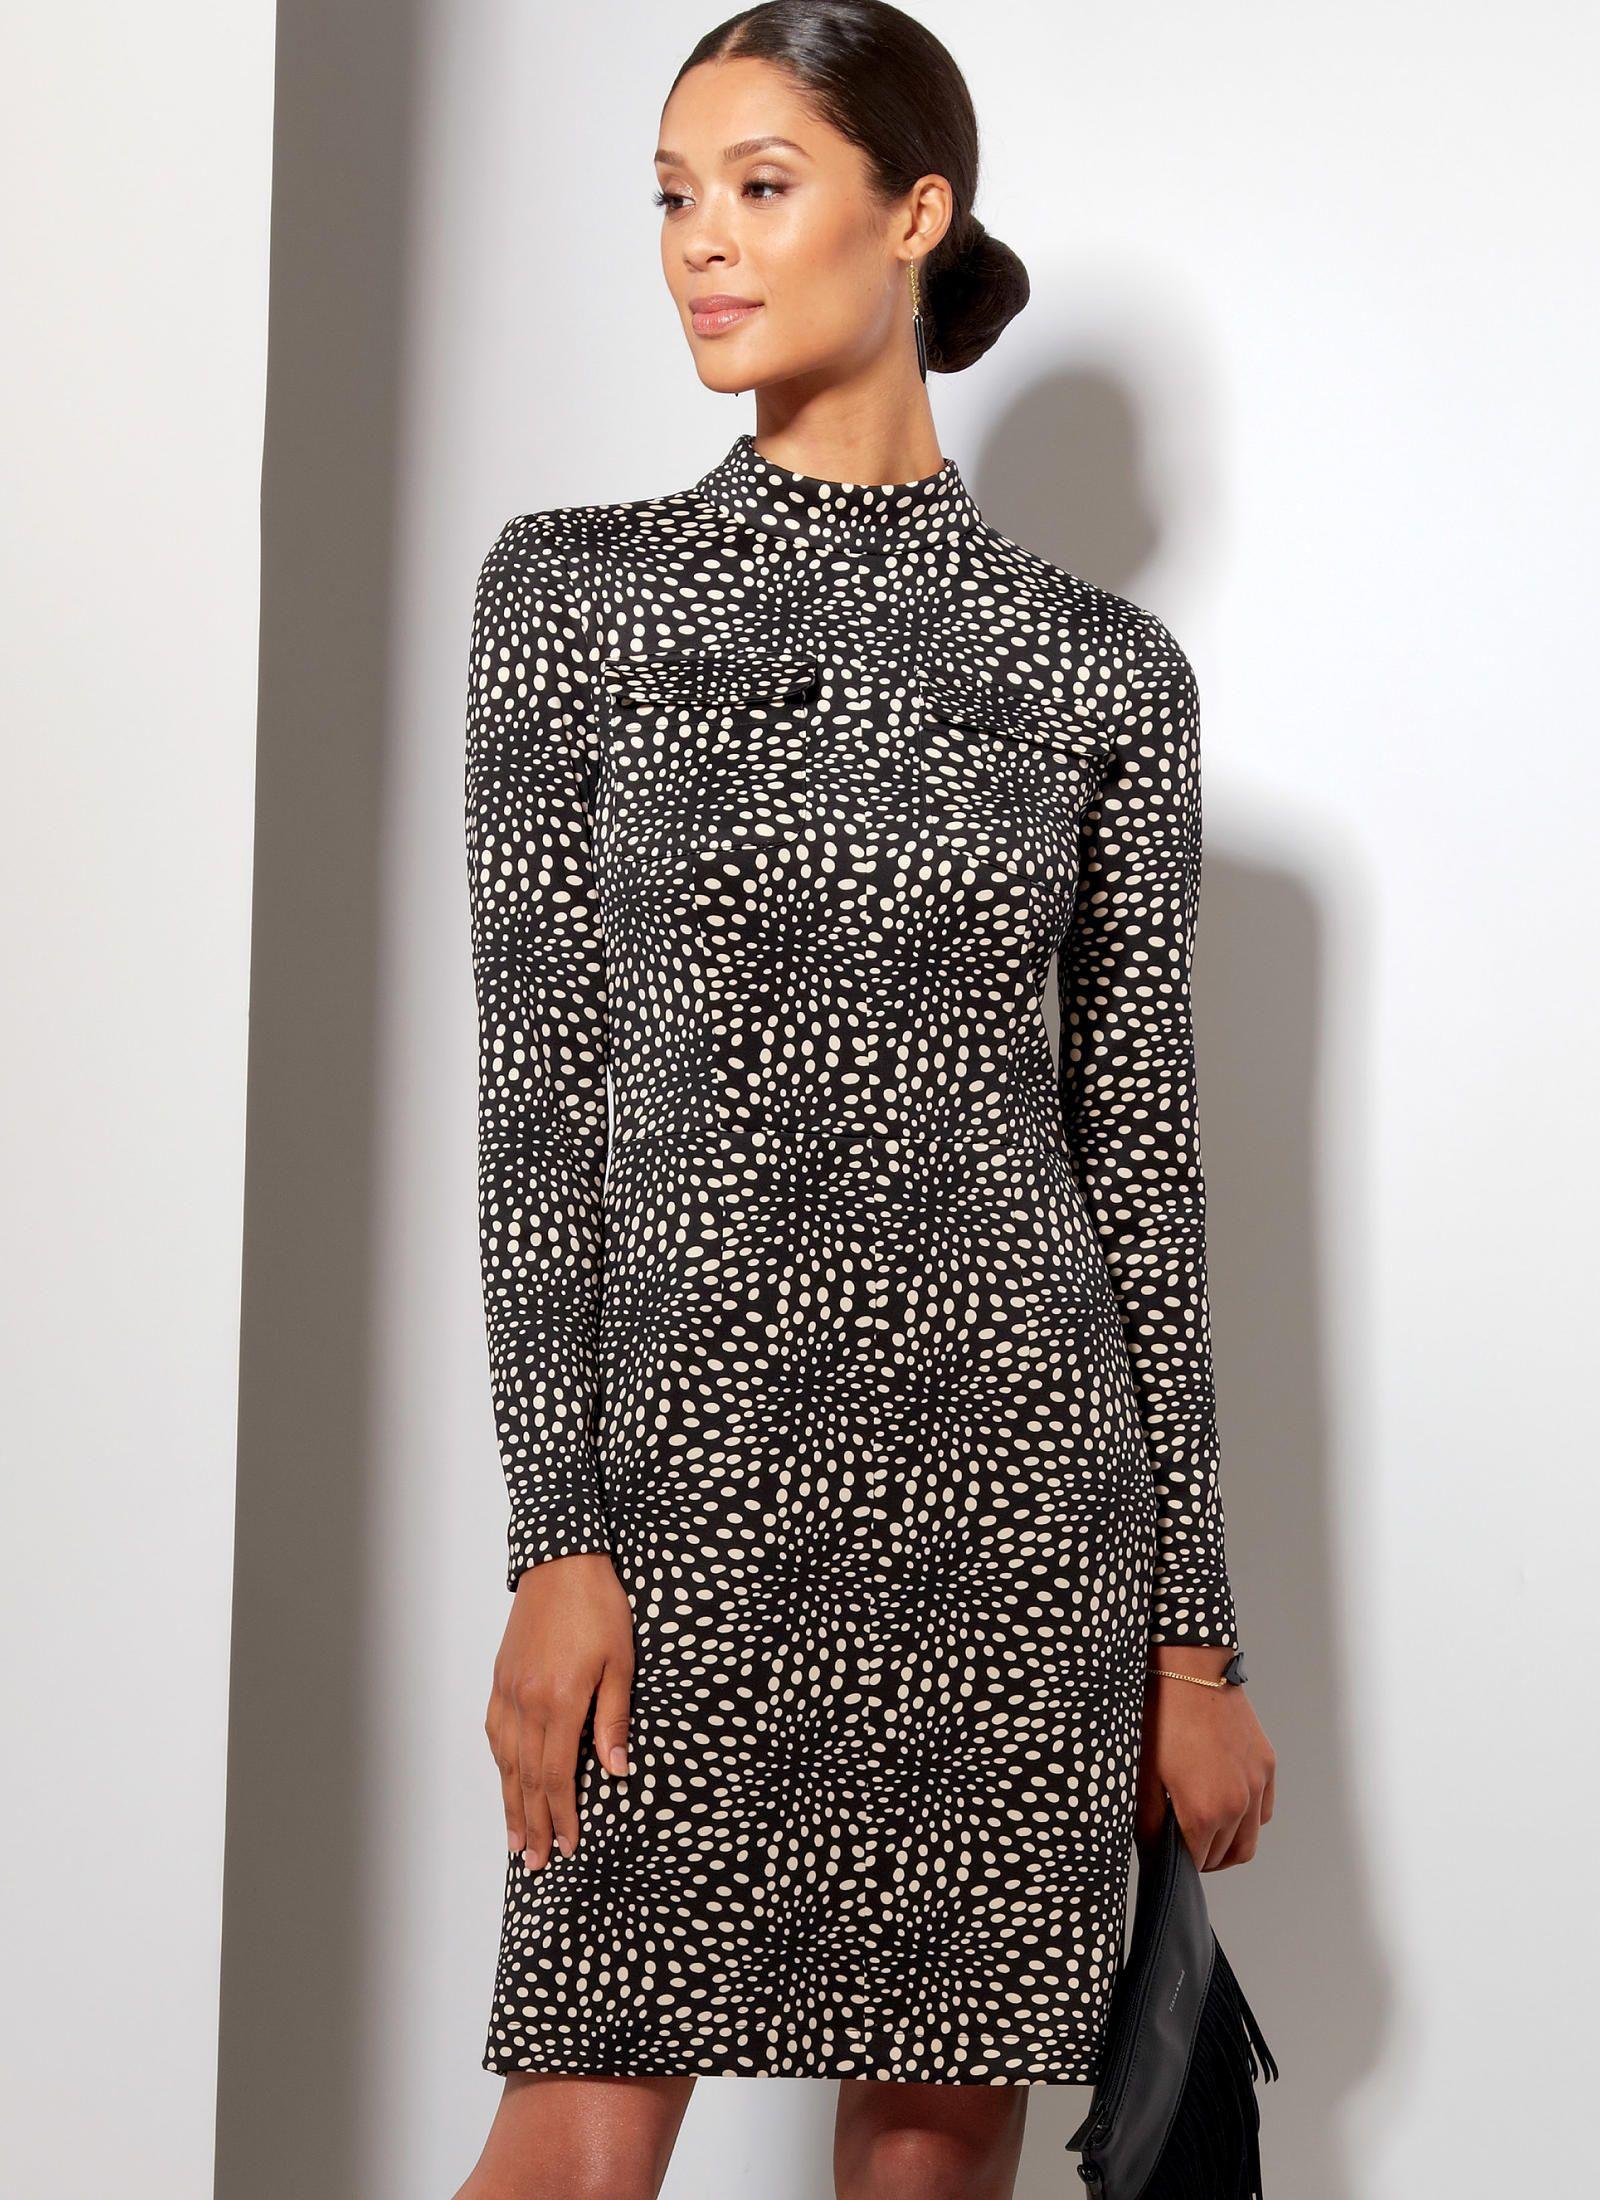 https://mccallpattern.mccall.com/m7539 | Knit Dress Patterns ...